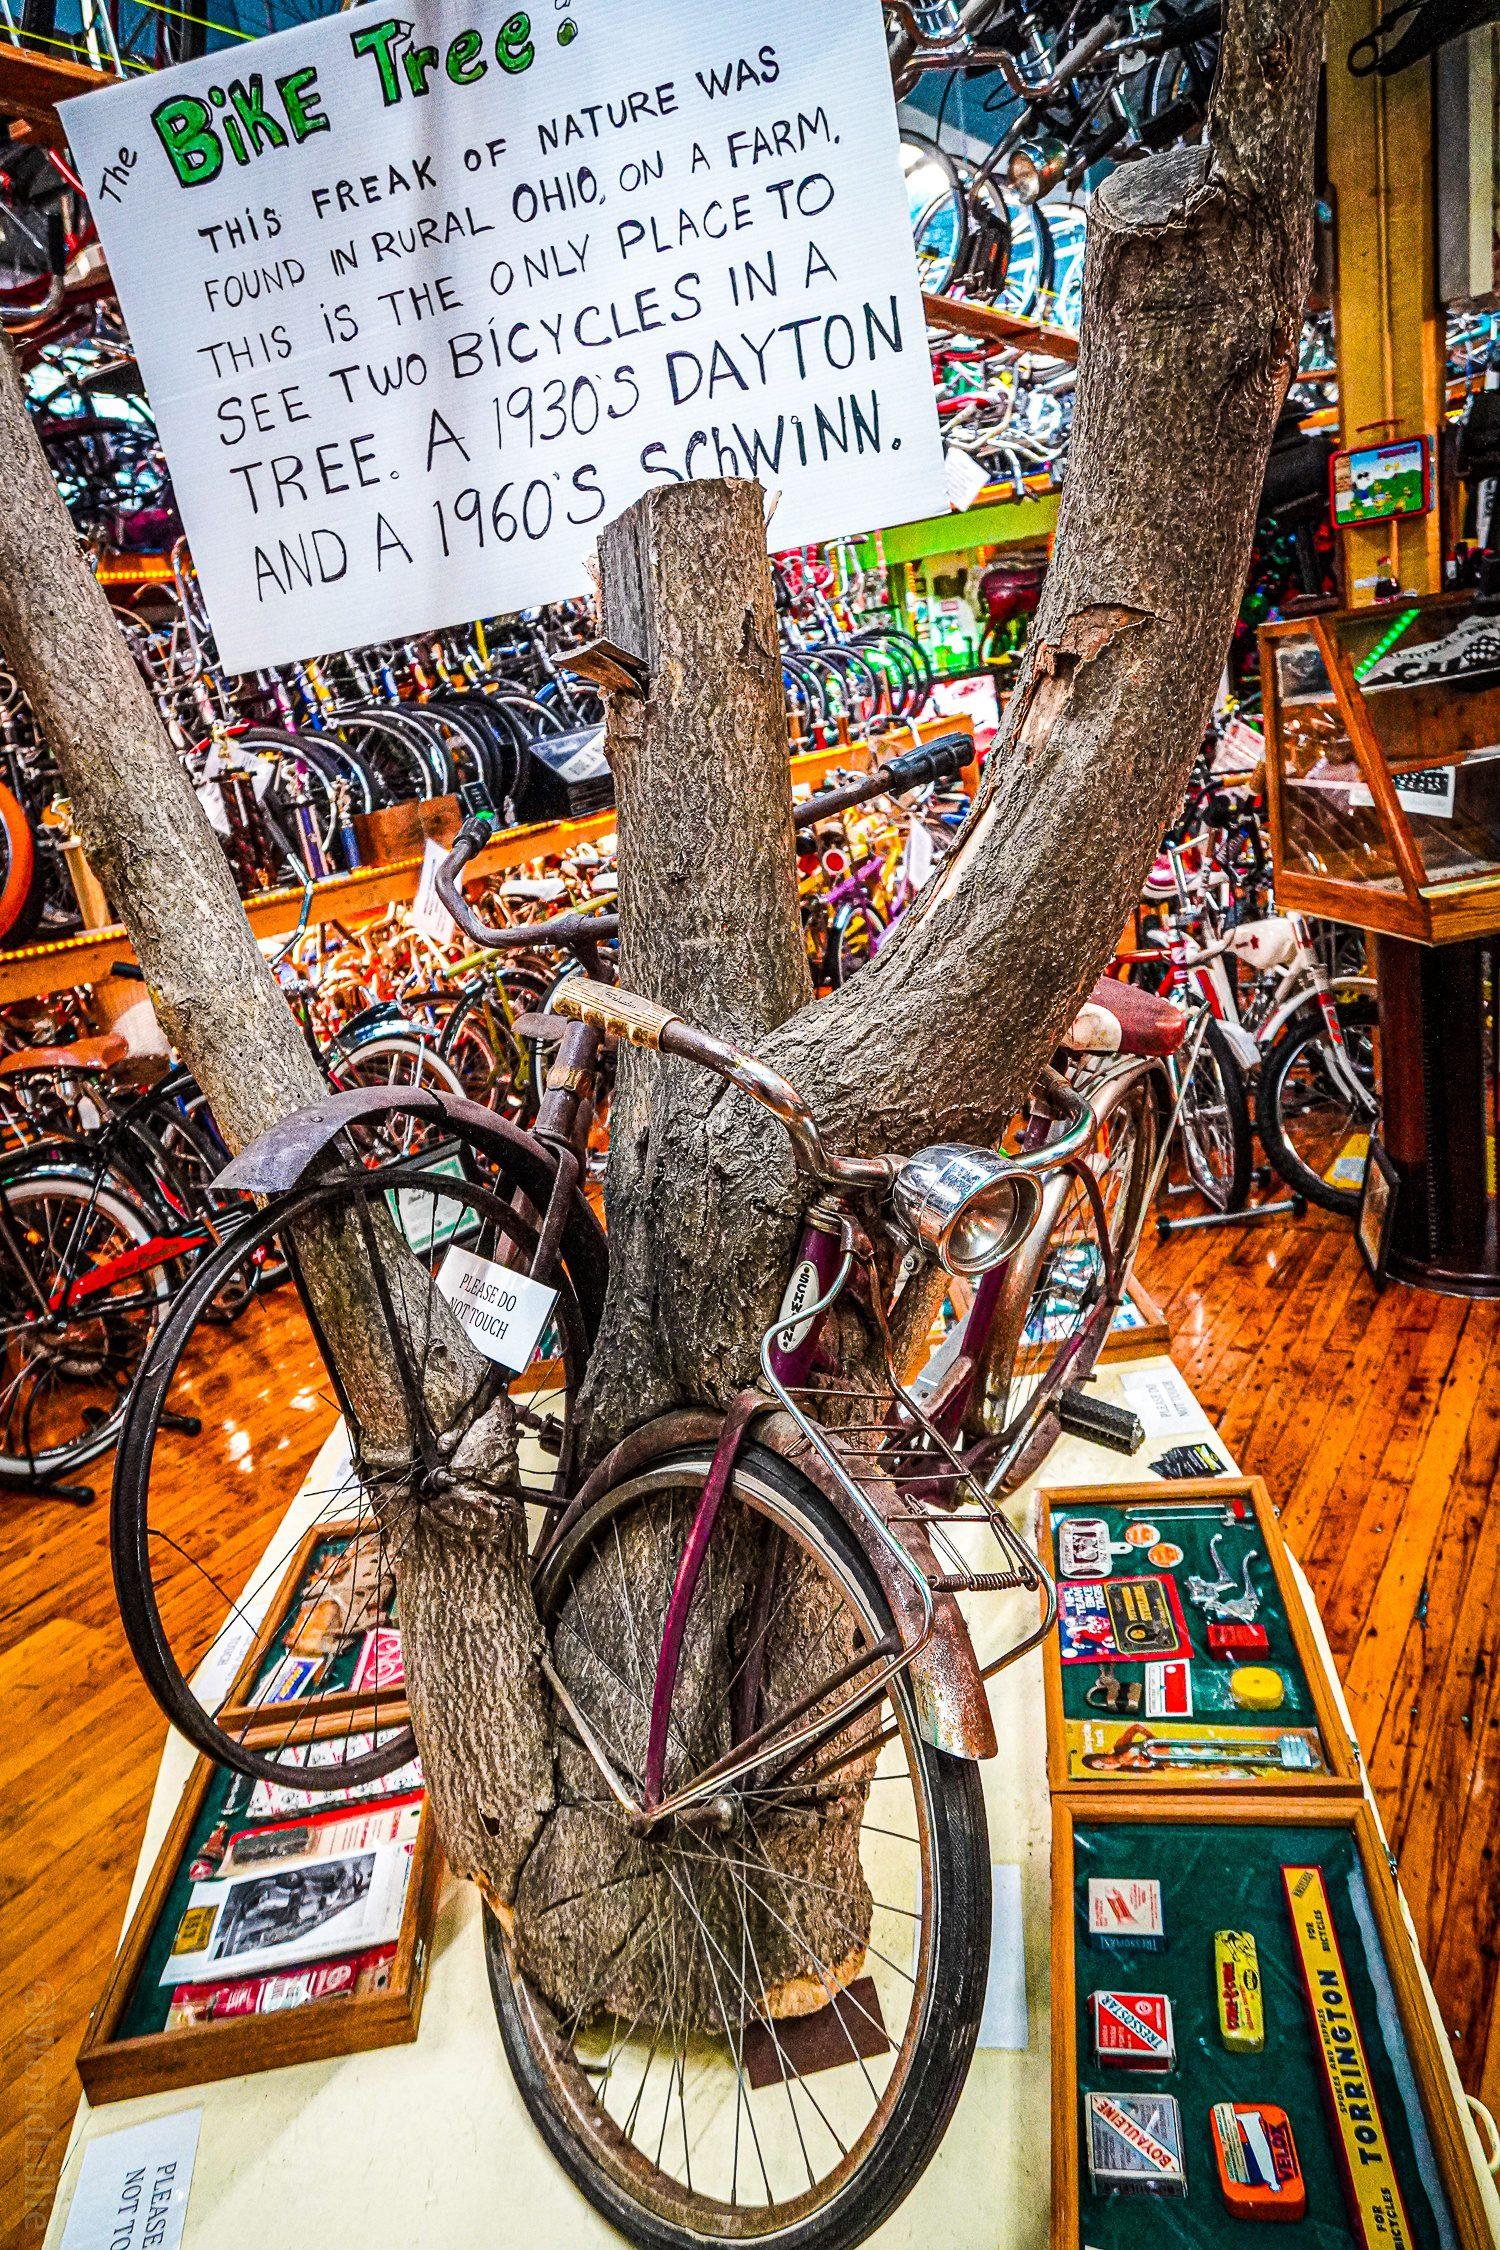 The tree that ate two vintage bikes!